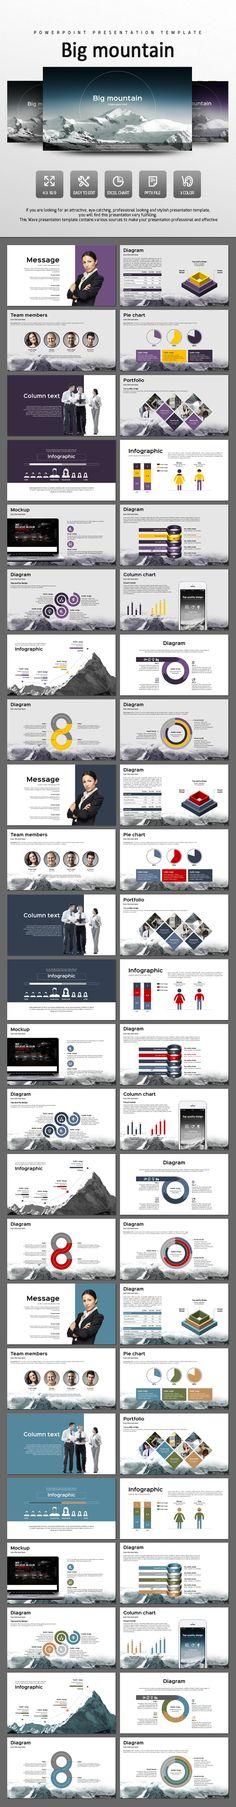 Big Mountain - PowerPoint Presentation Template #design #slides Download: http://graphicriver.net/item/big-mountain/14442476?ref=ksioks